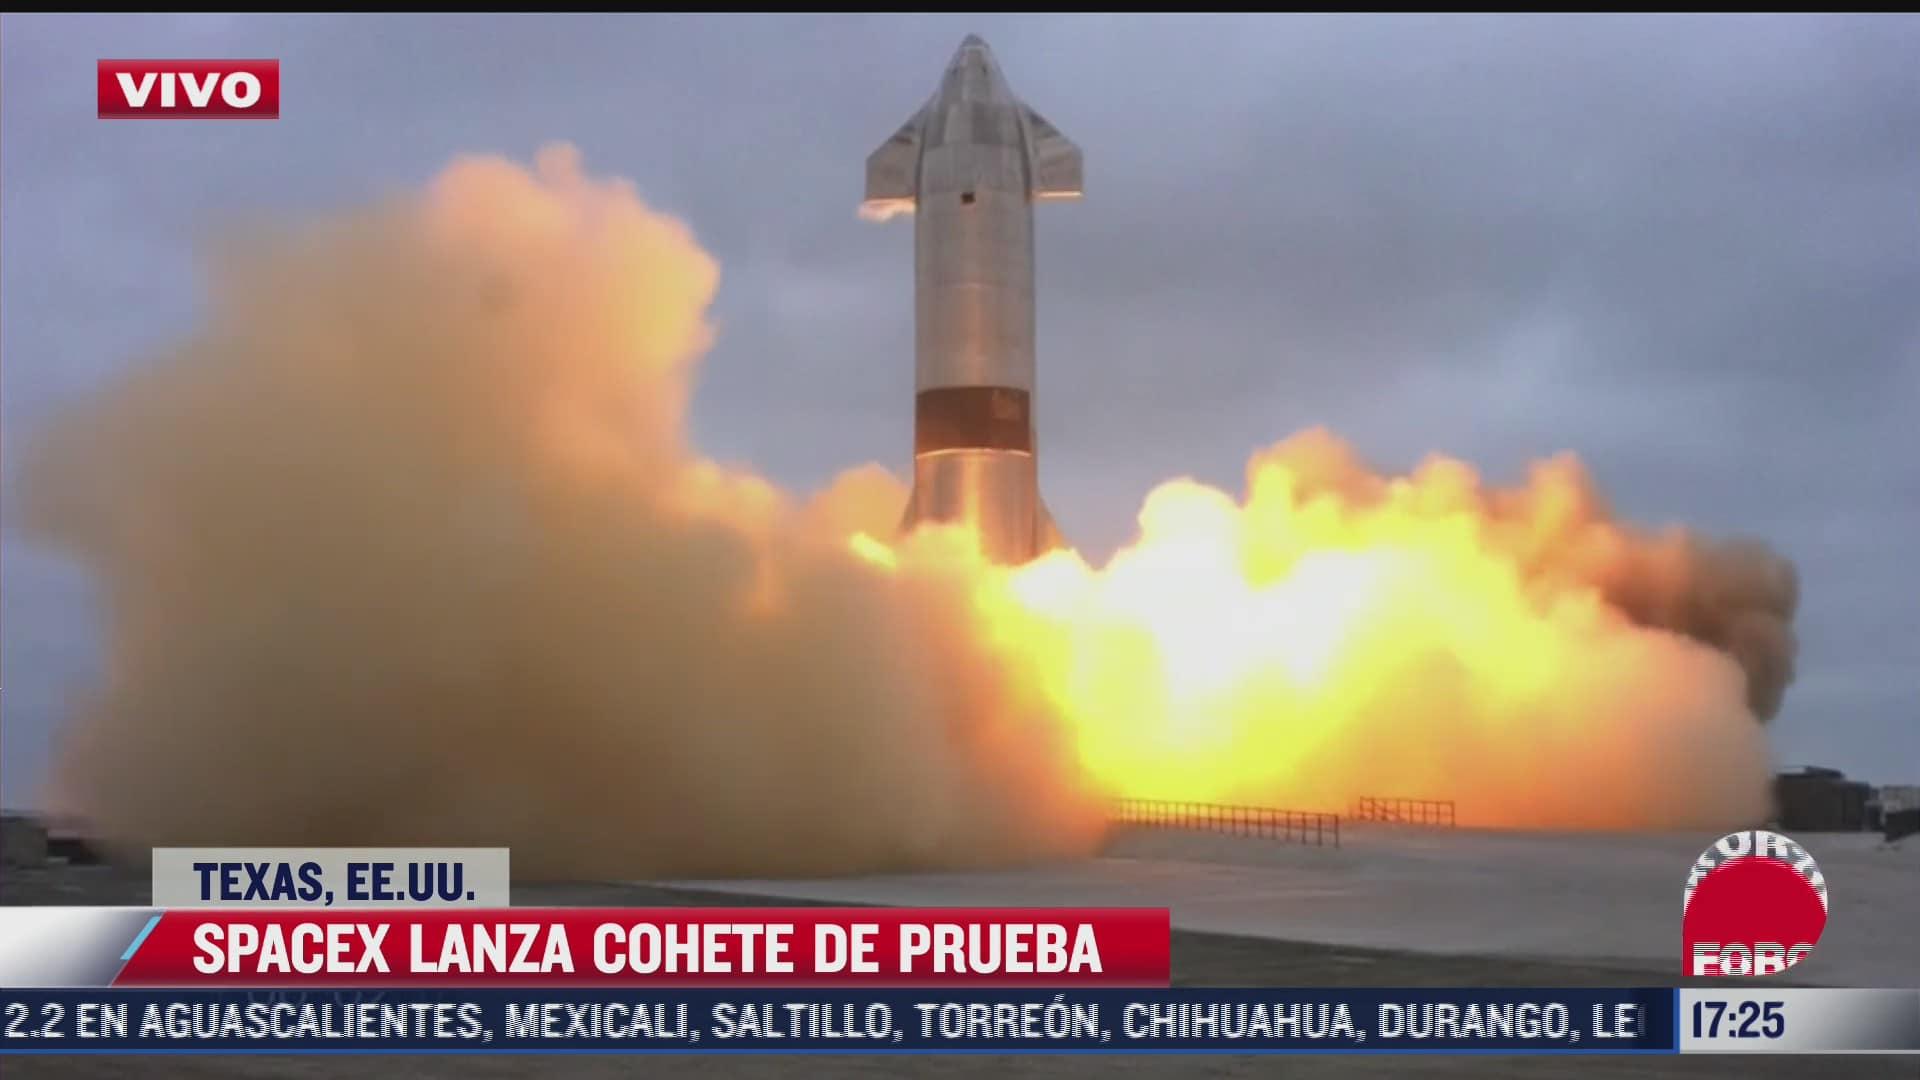 spacex lanza cohete de prueba